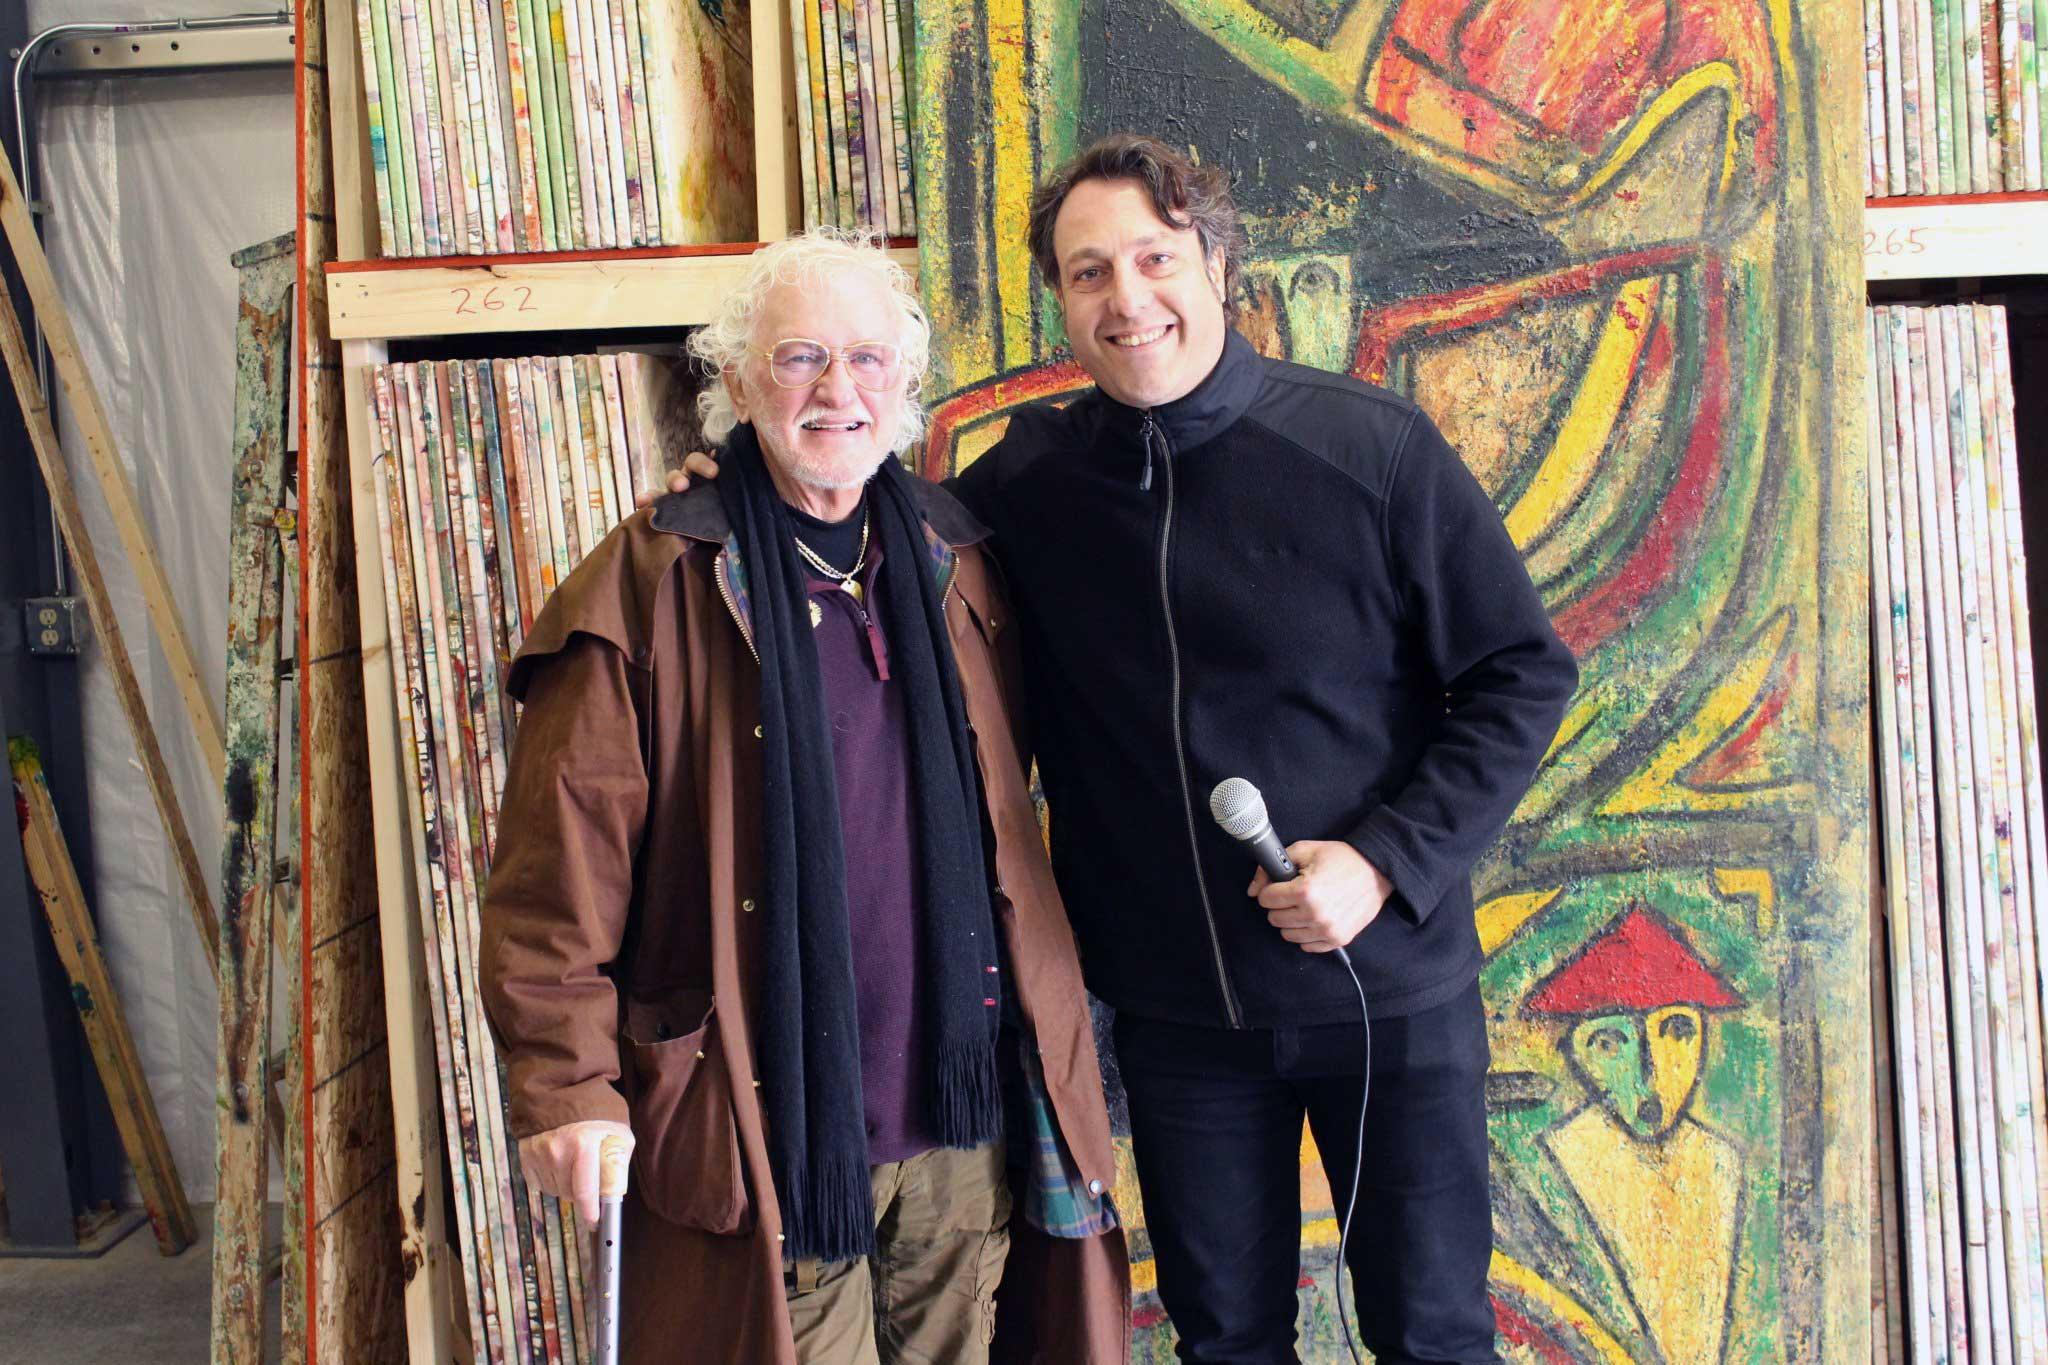 Matt Lamb and David Leonardis